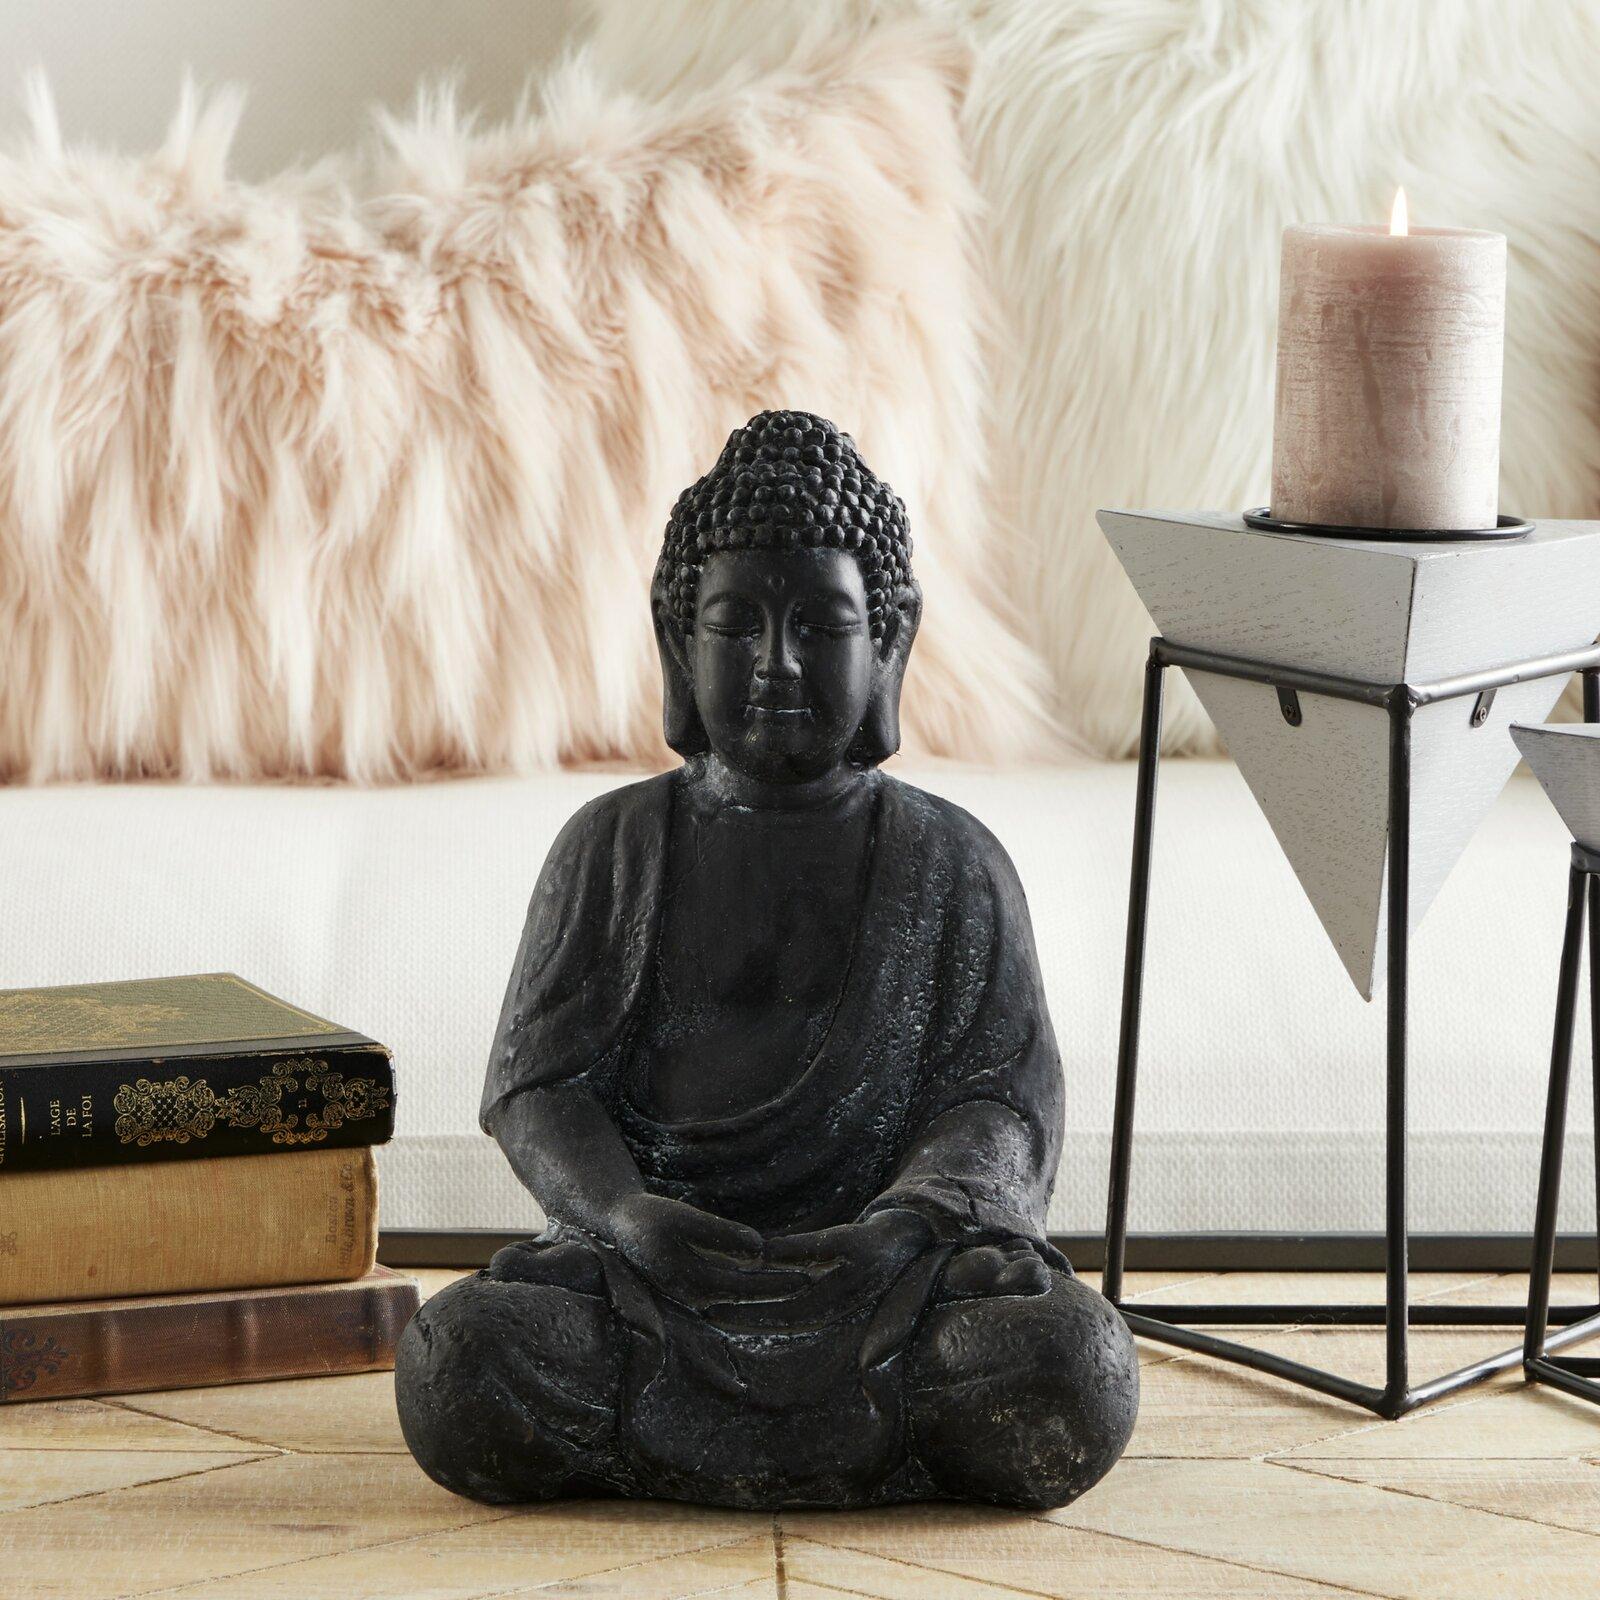 meditation-buddha-statue-dark-black-finish-12-inch-weathered-clay-sculpture-heavy-high-quality-buddhist-decor-for-interior-meditation-area